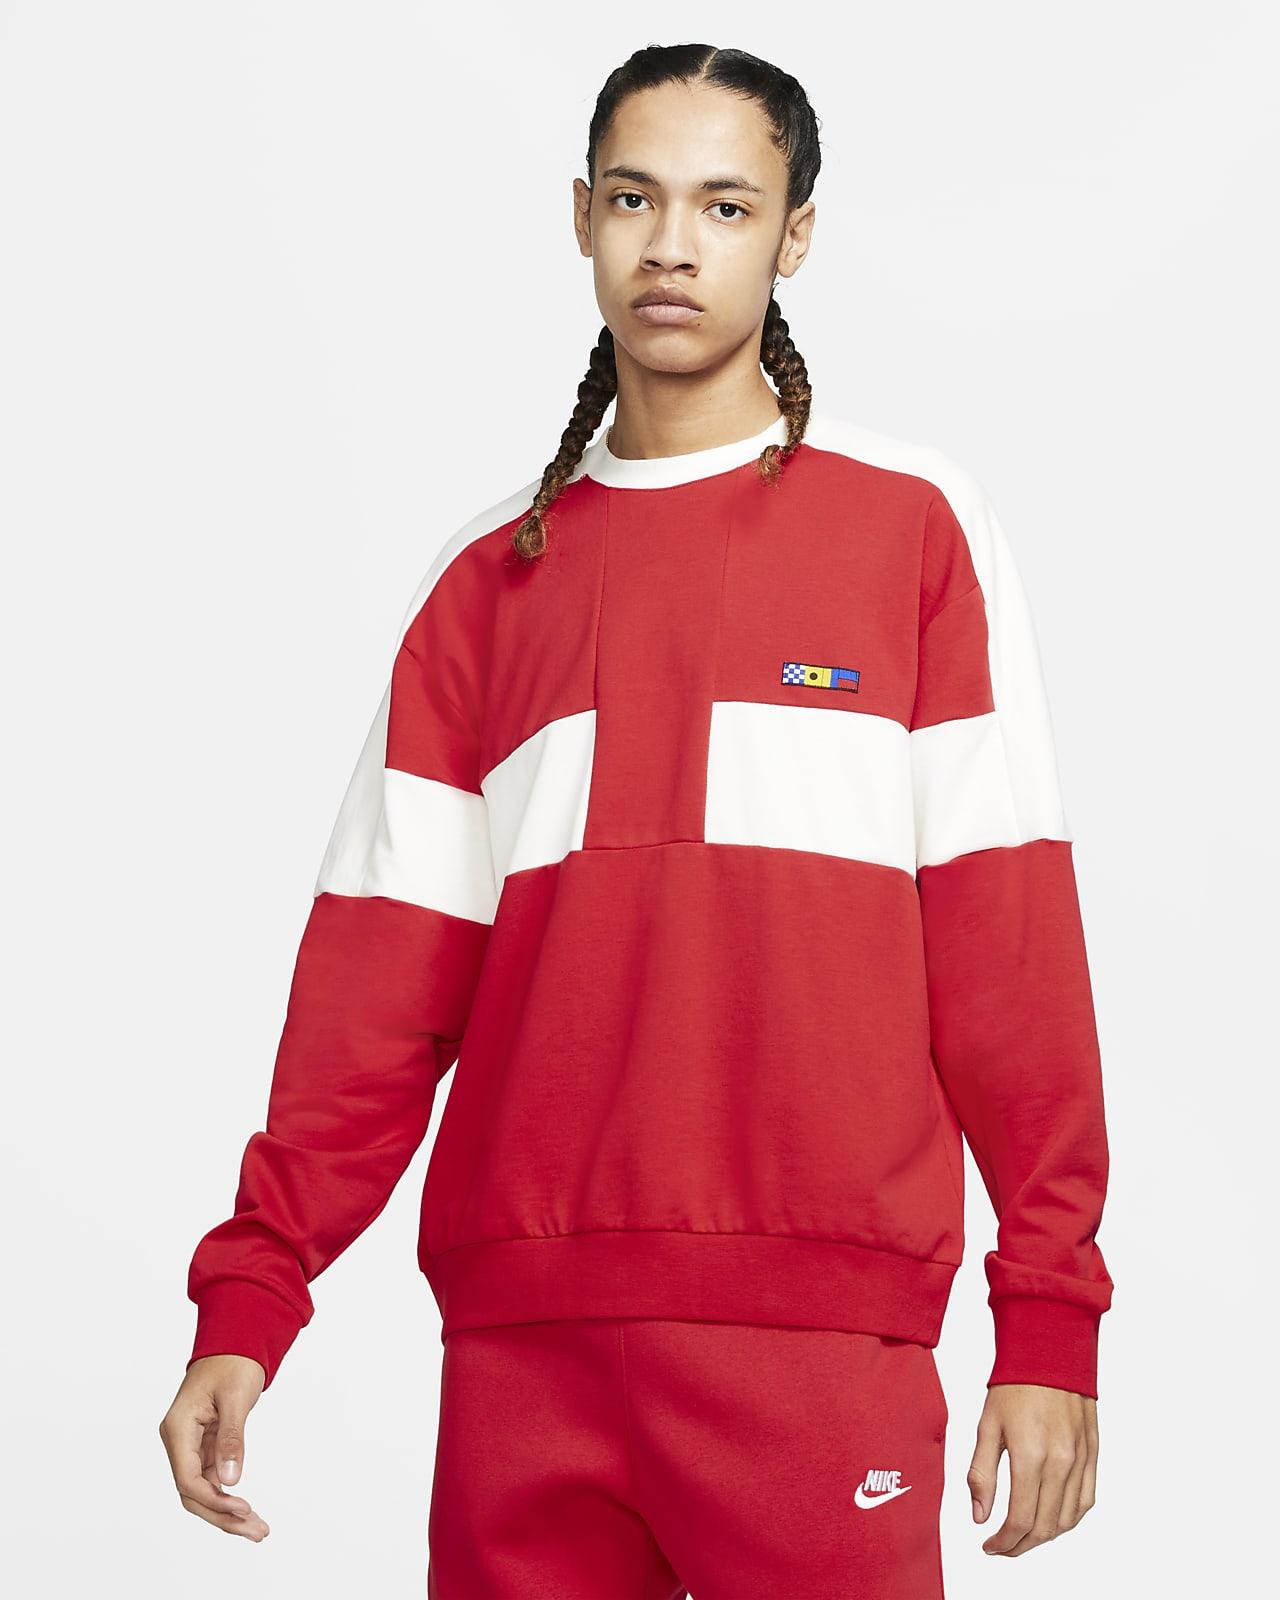 Nike Sportswear Reissue Men S French Terry Crew Nike Lu [ 1600 x 1280 Pixel ]